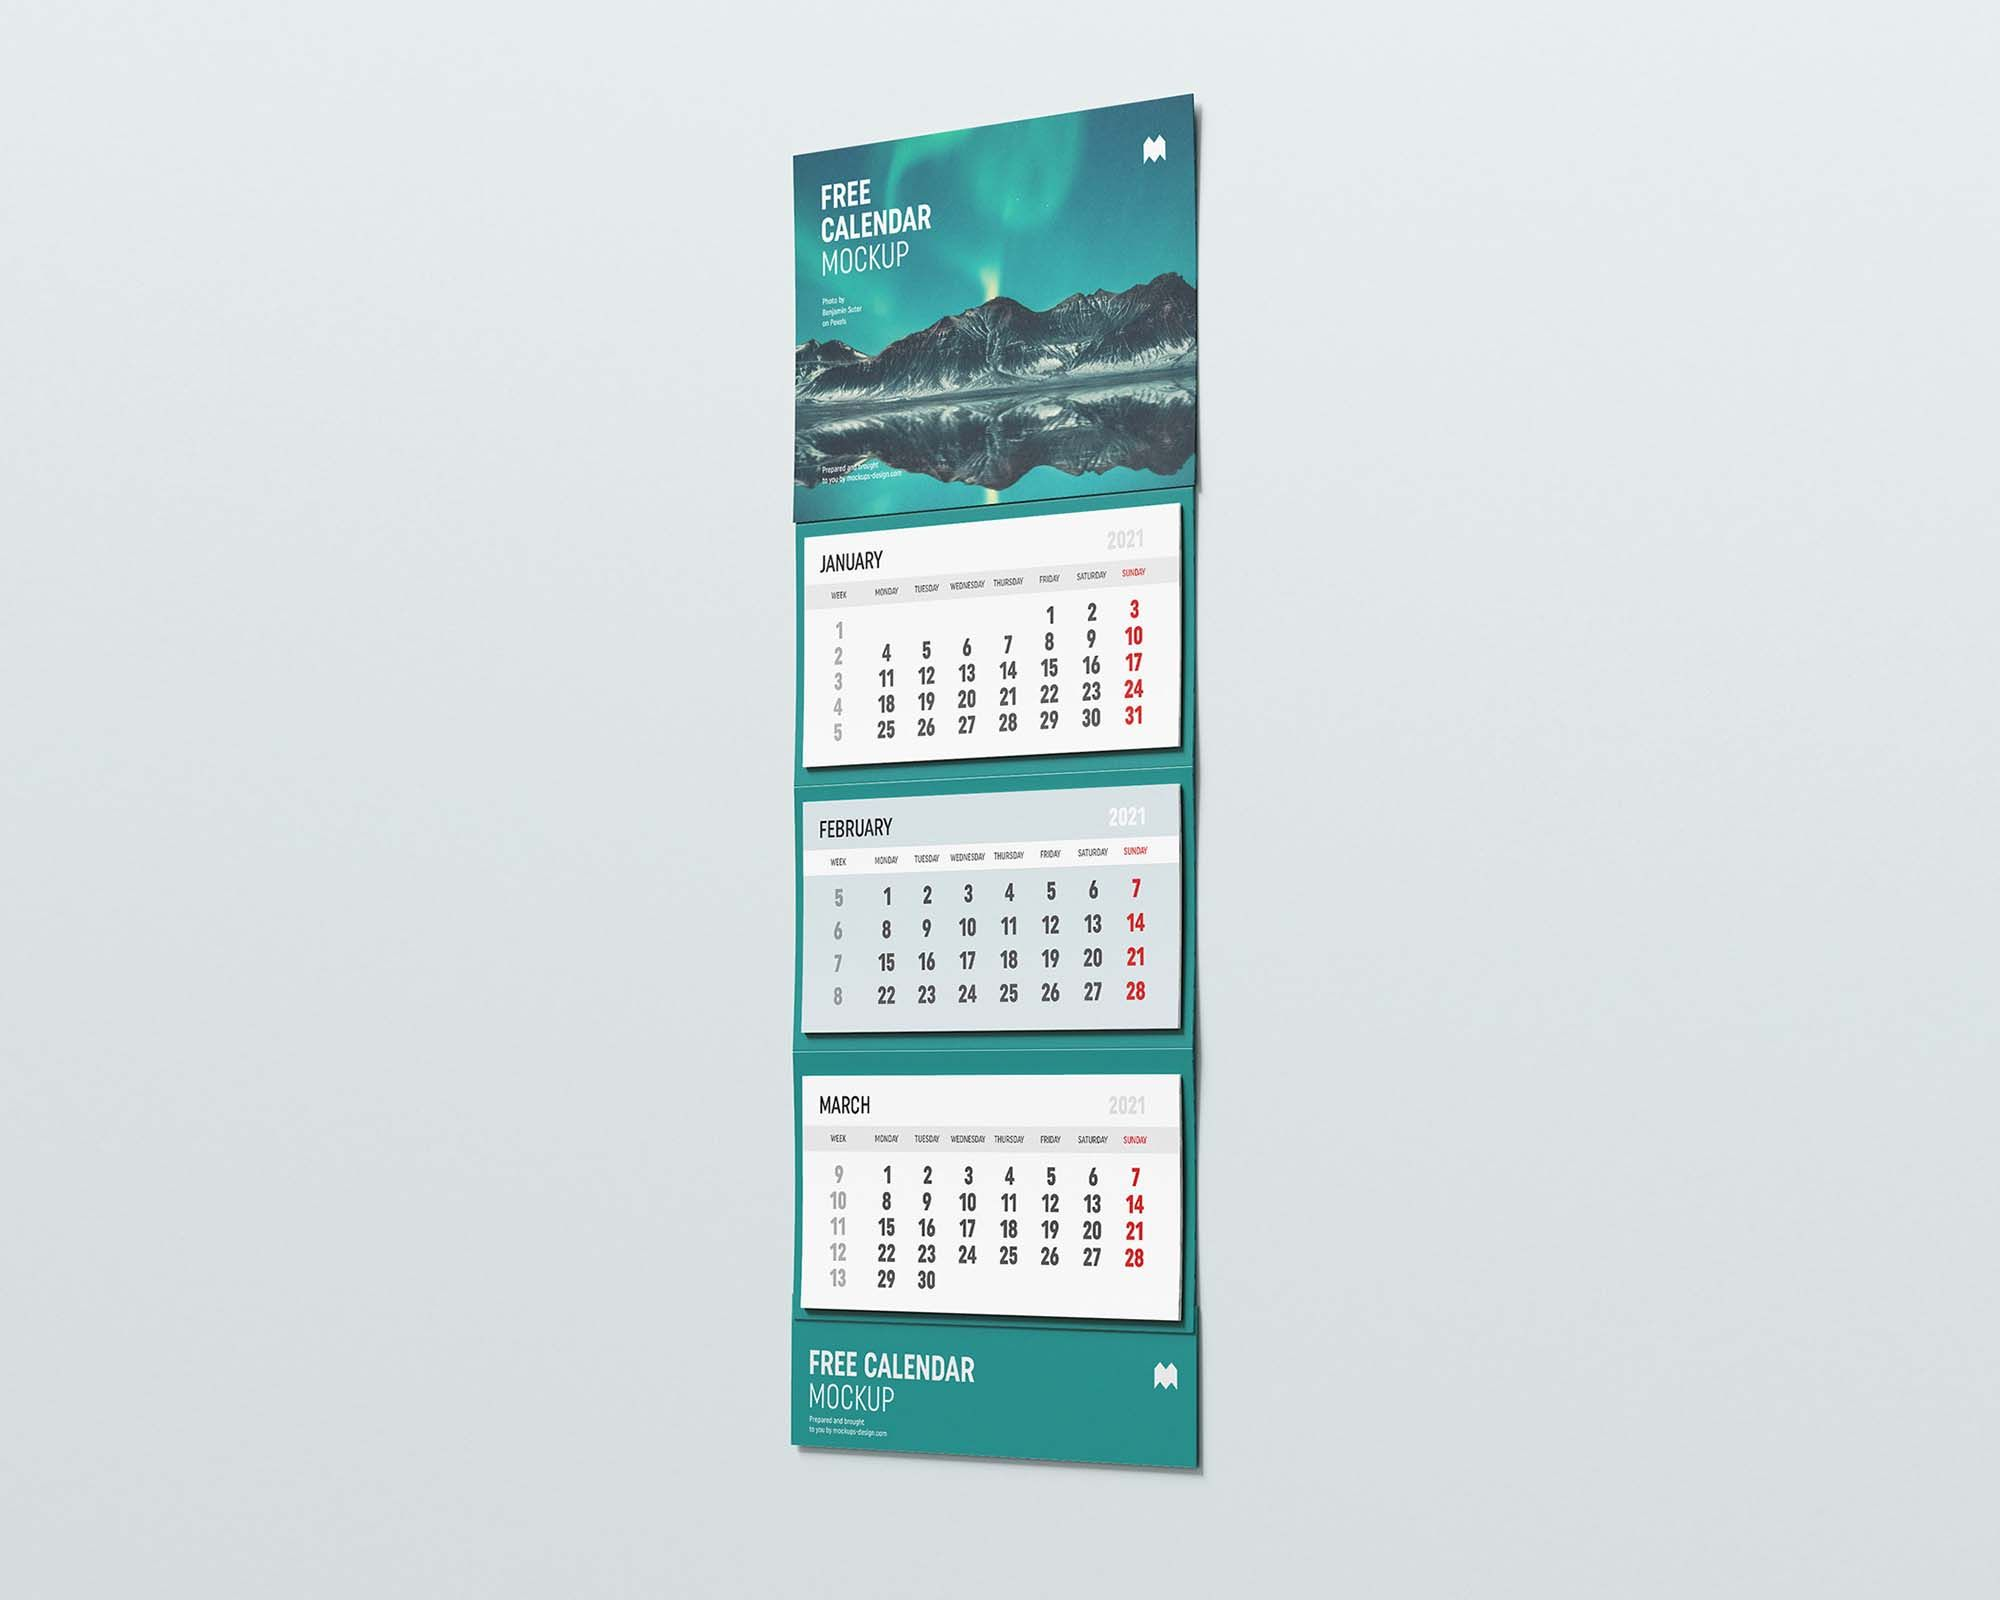 Calendar free mockup